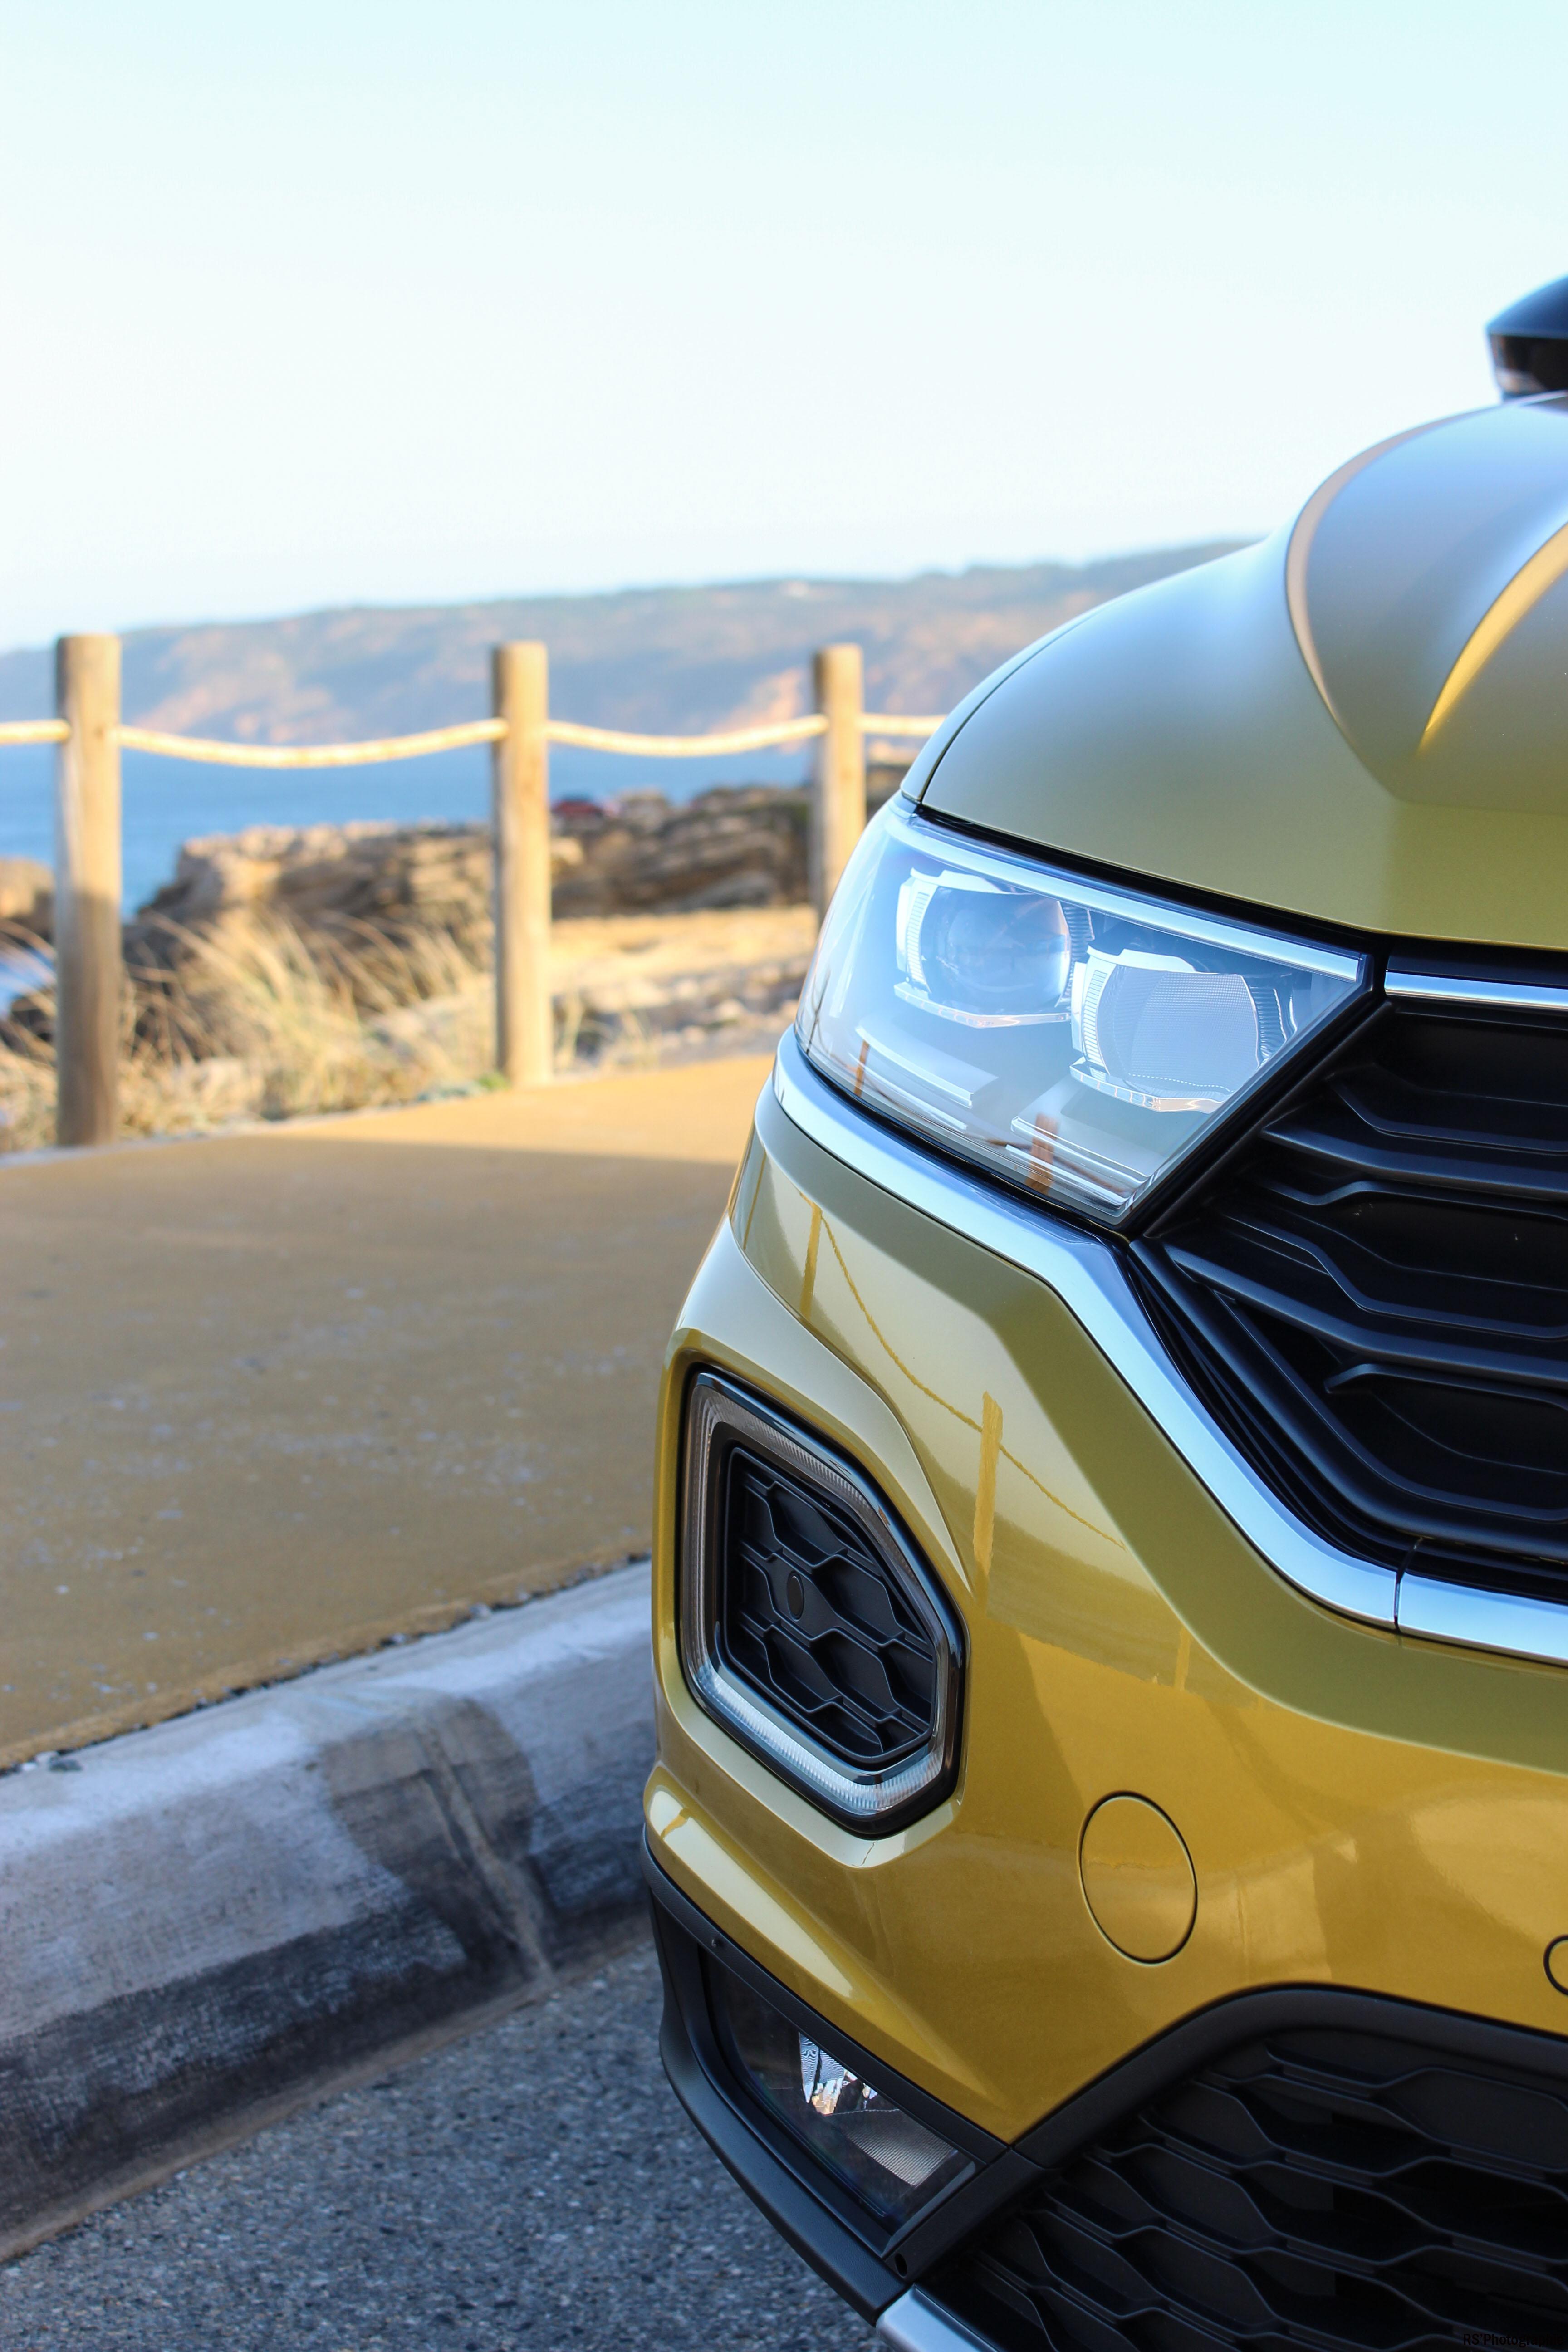 Volkswagentroc83-vw-t-roc-avant-front-Arnaud Demasier-RSPhotographie